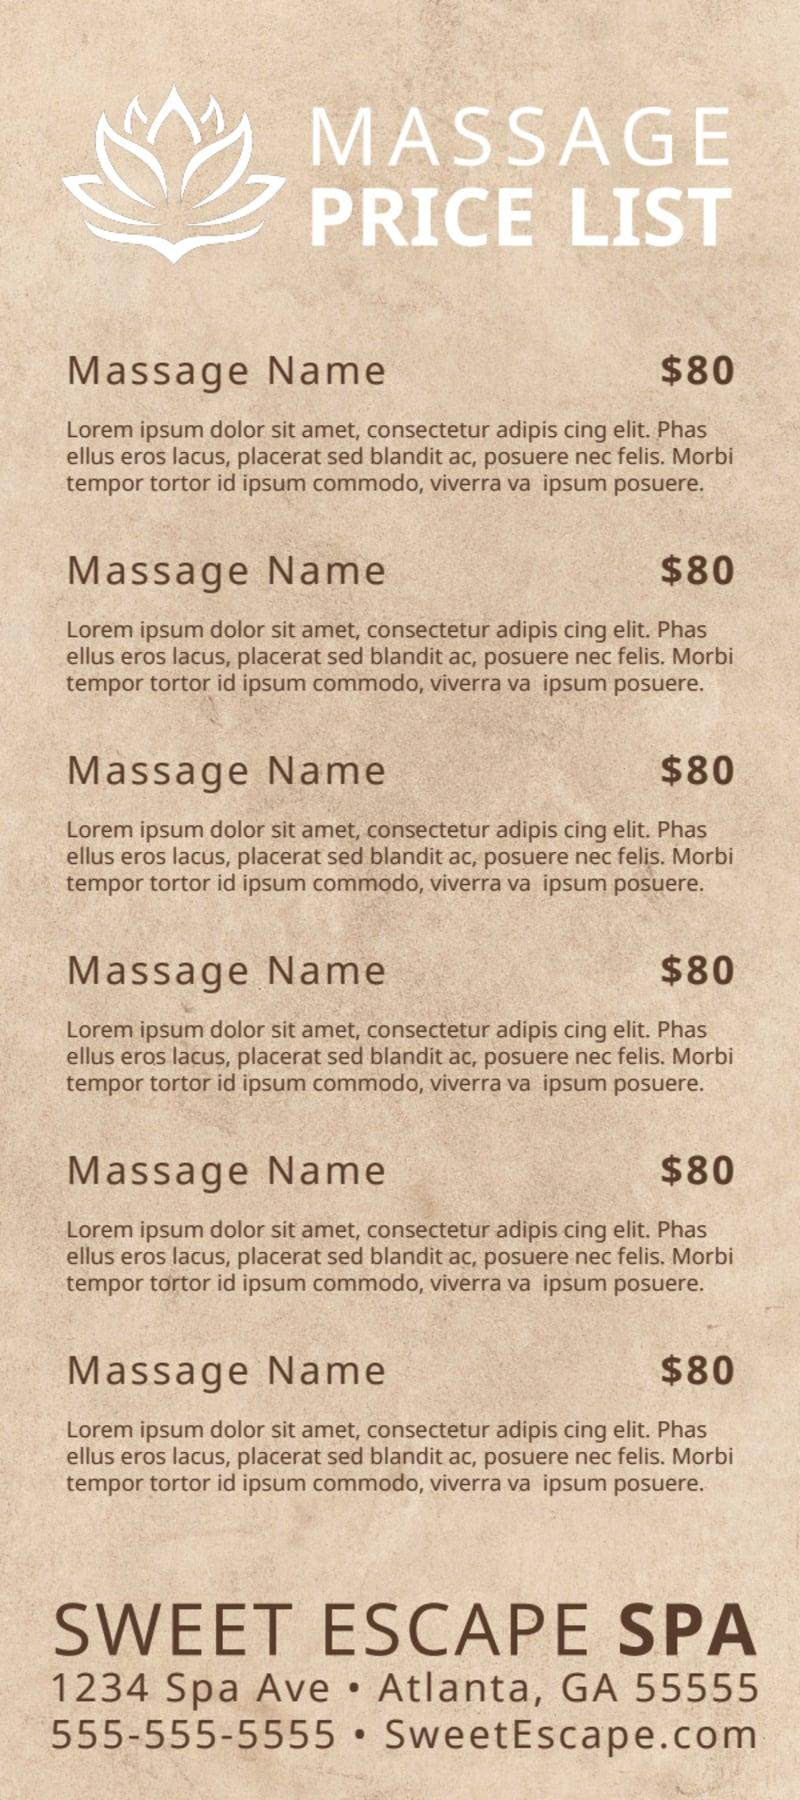 Elegant Massage Price List Flyer Template Preview 3